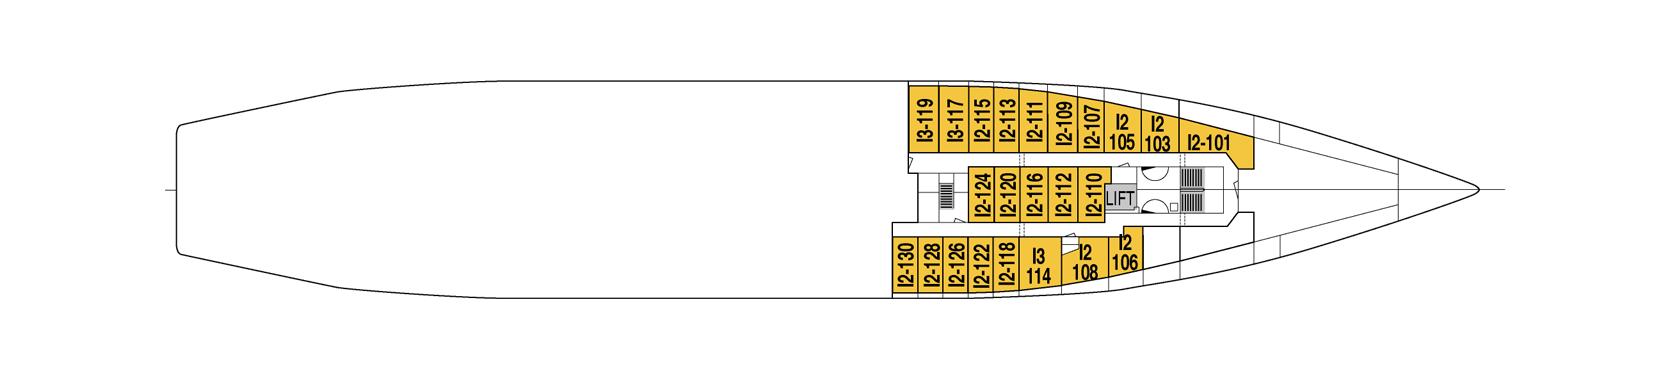 Vesteralen Deck A